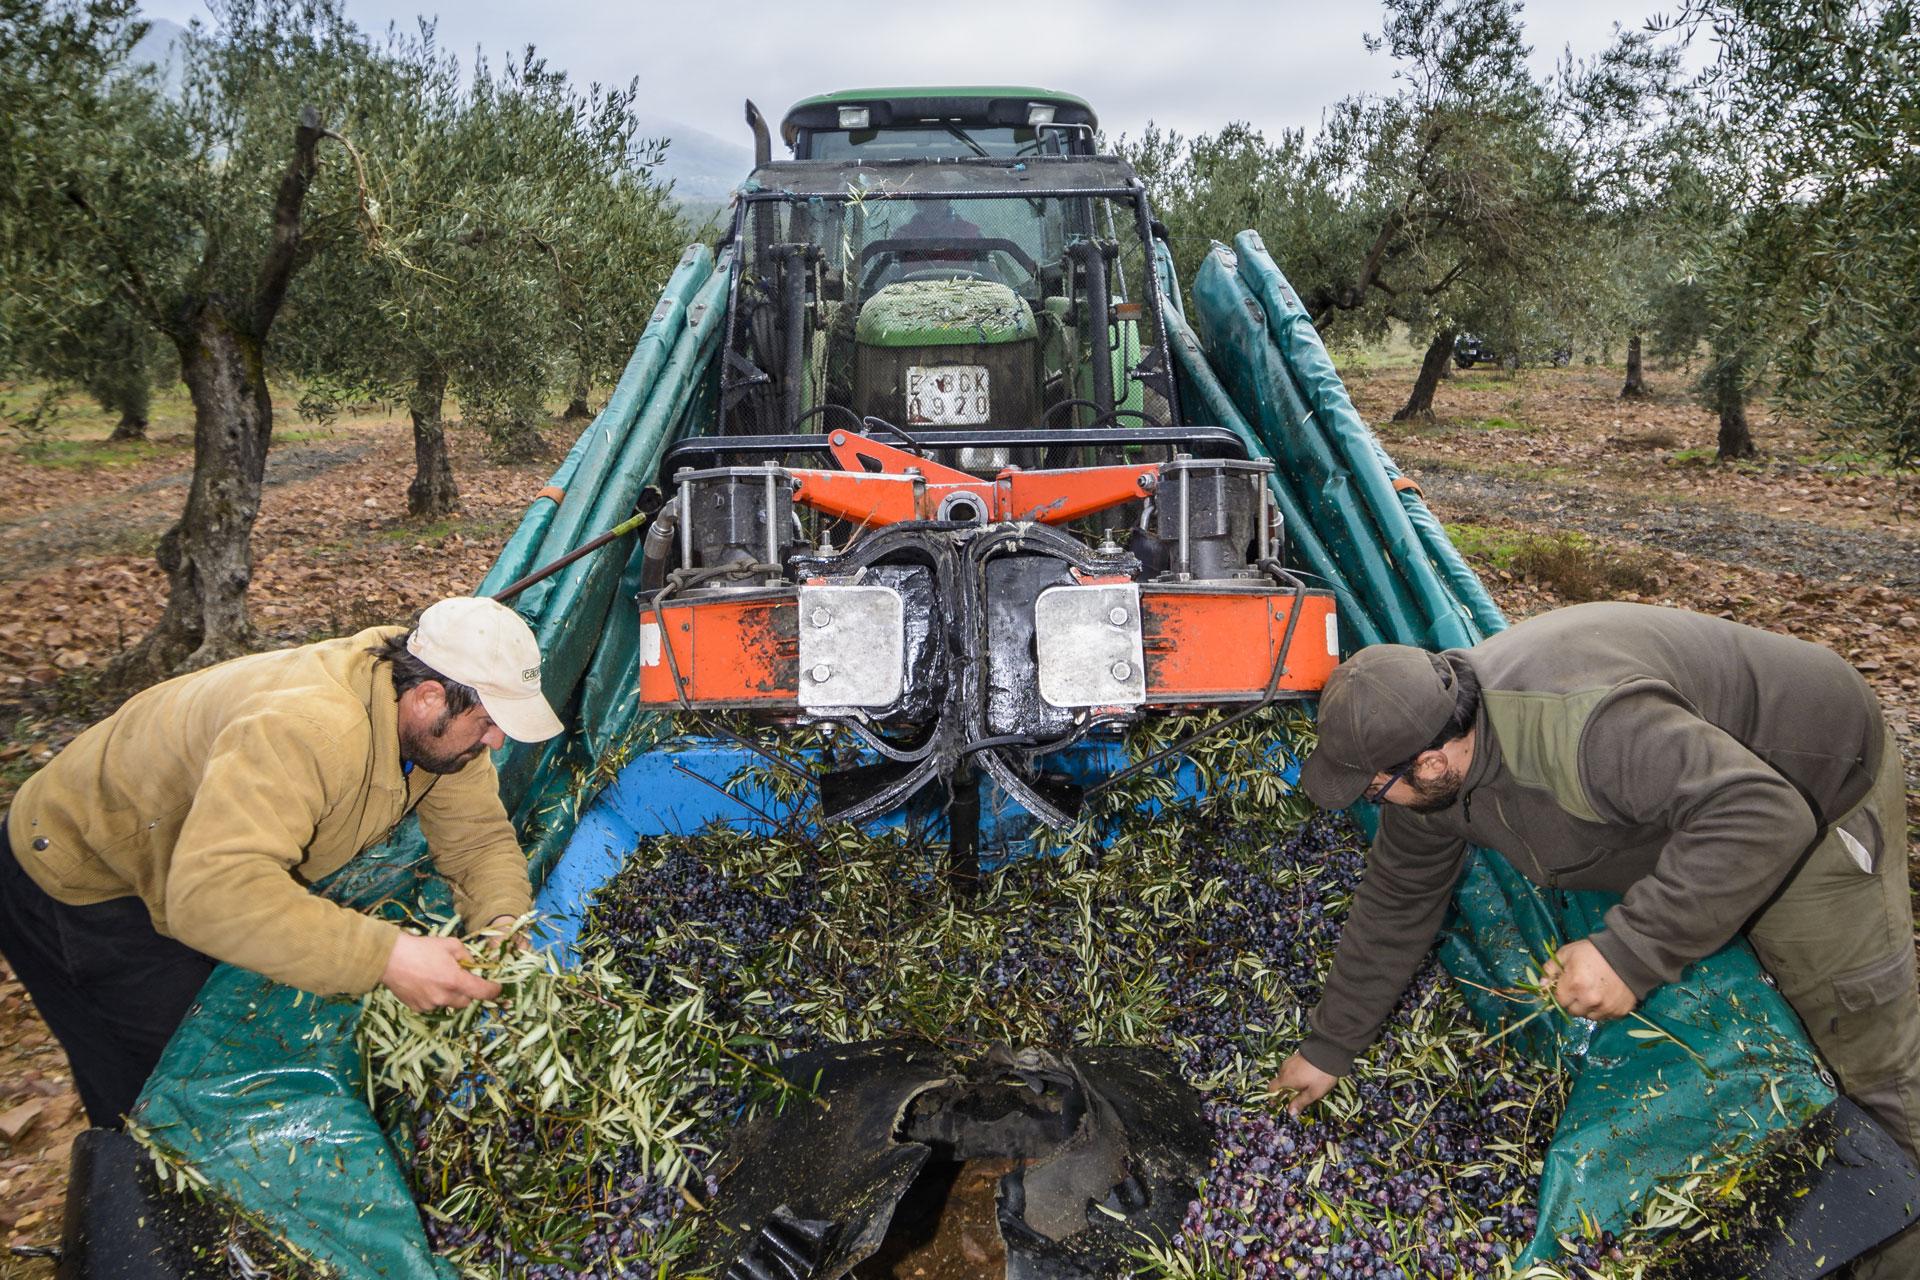 Recolecta de olivas para aove